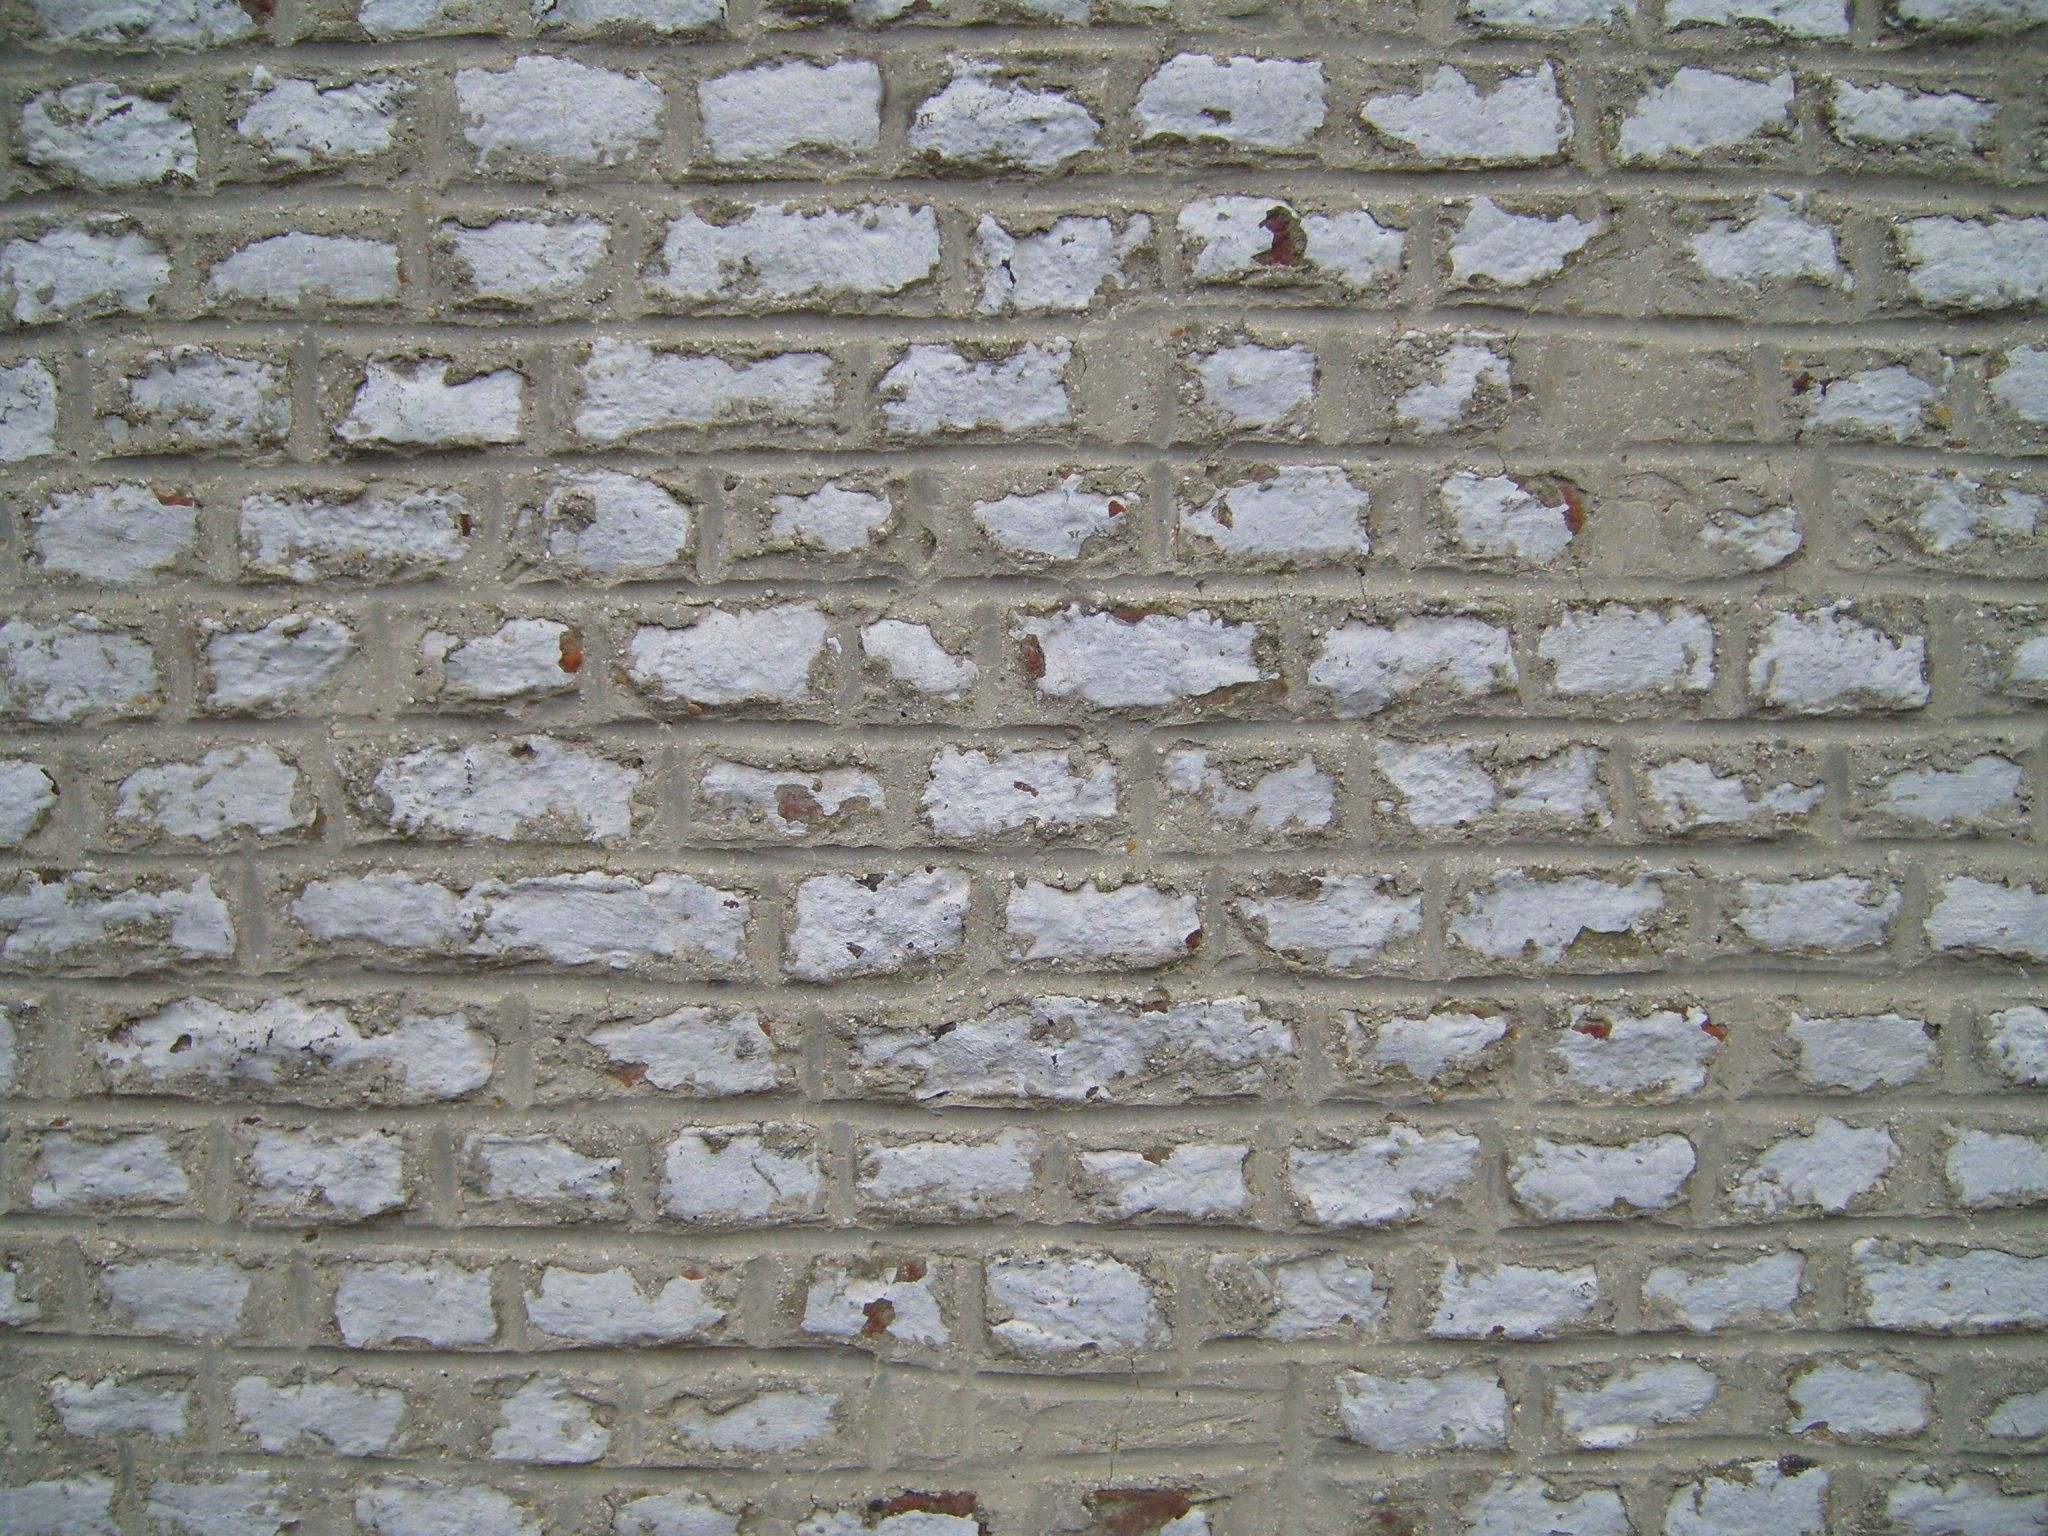 File:Decorative rock wall.jpg - Wikimedia Commons